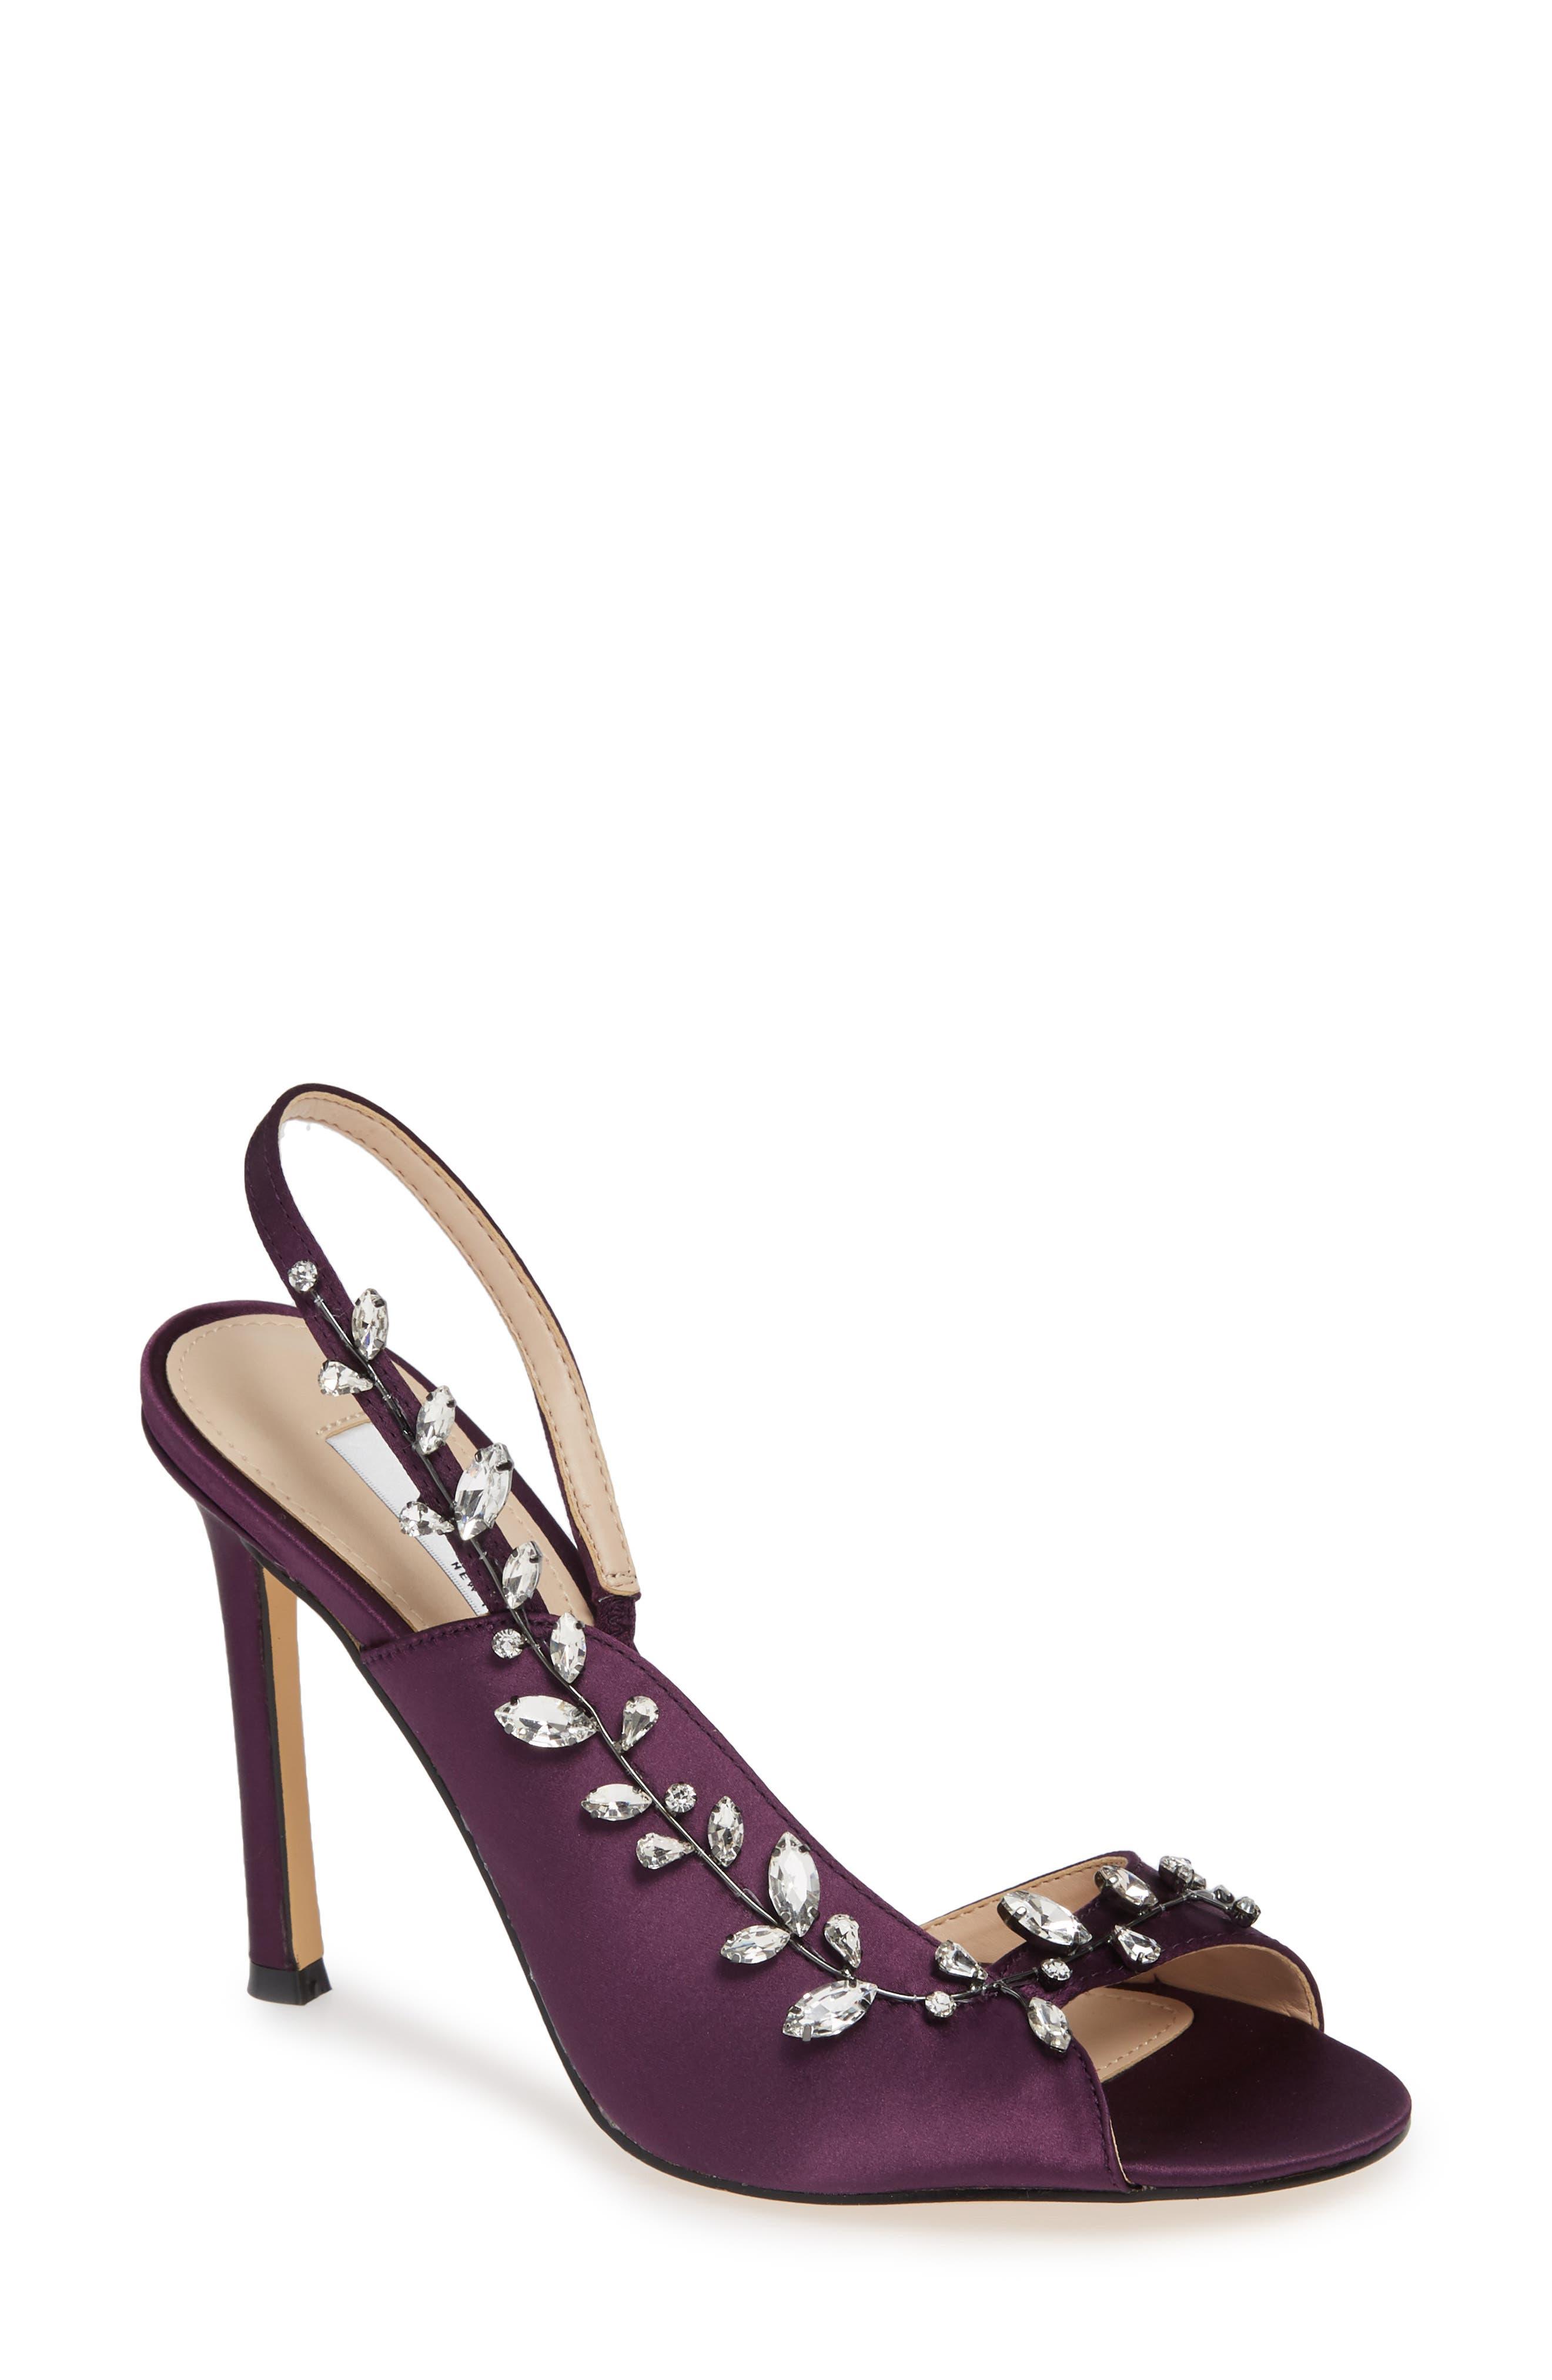 NINA, Deanna Embellished Sandal, Main thumbnail 1, color, EGGPLANT SATIN